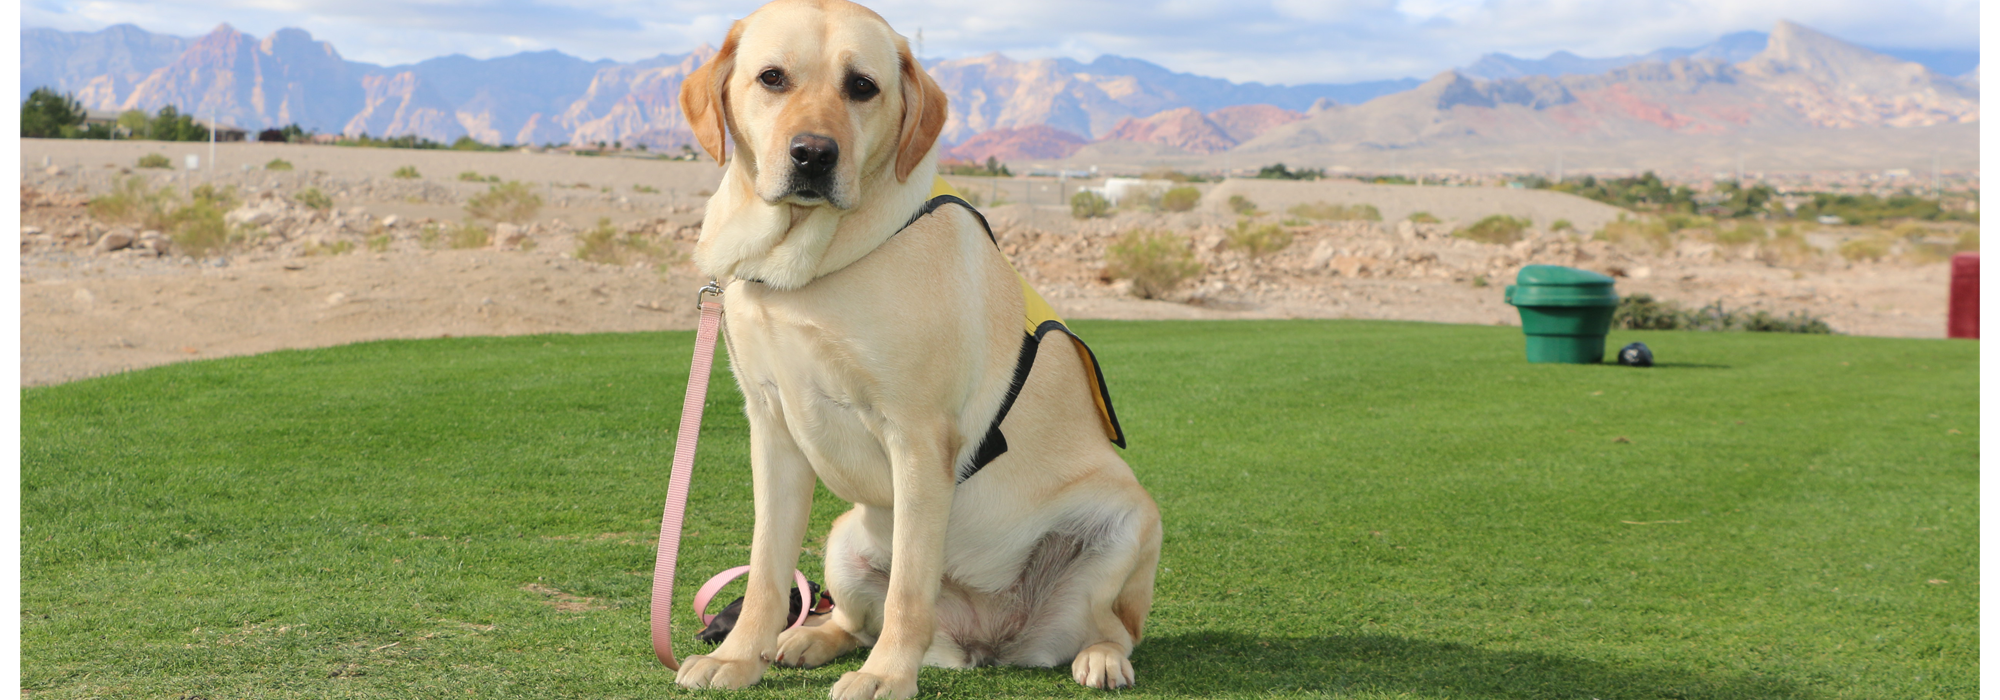 dog in training, yellow lab, golf course, las vegas